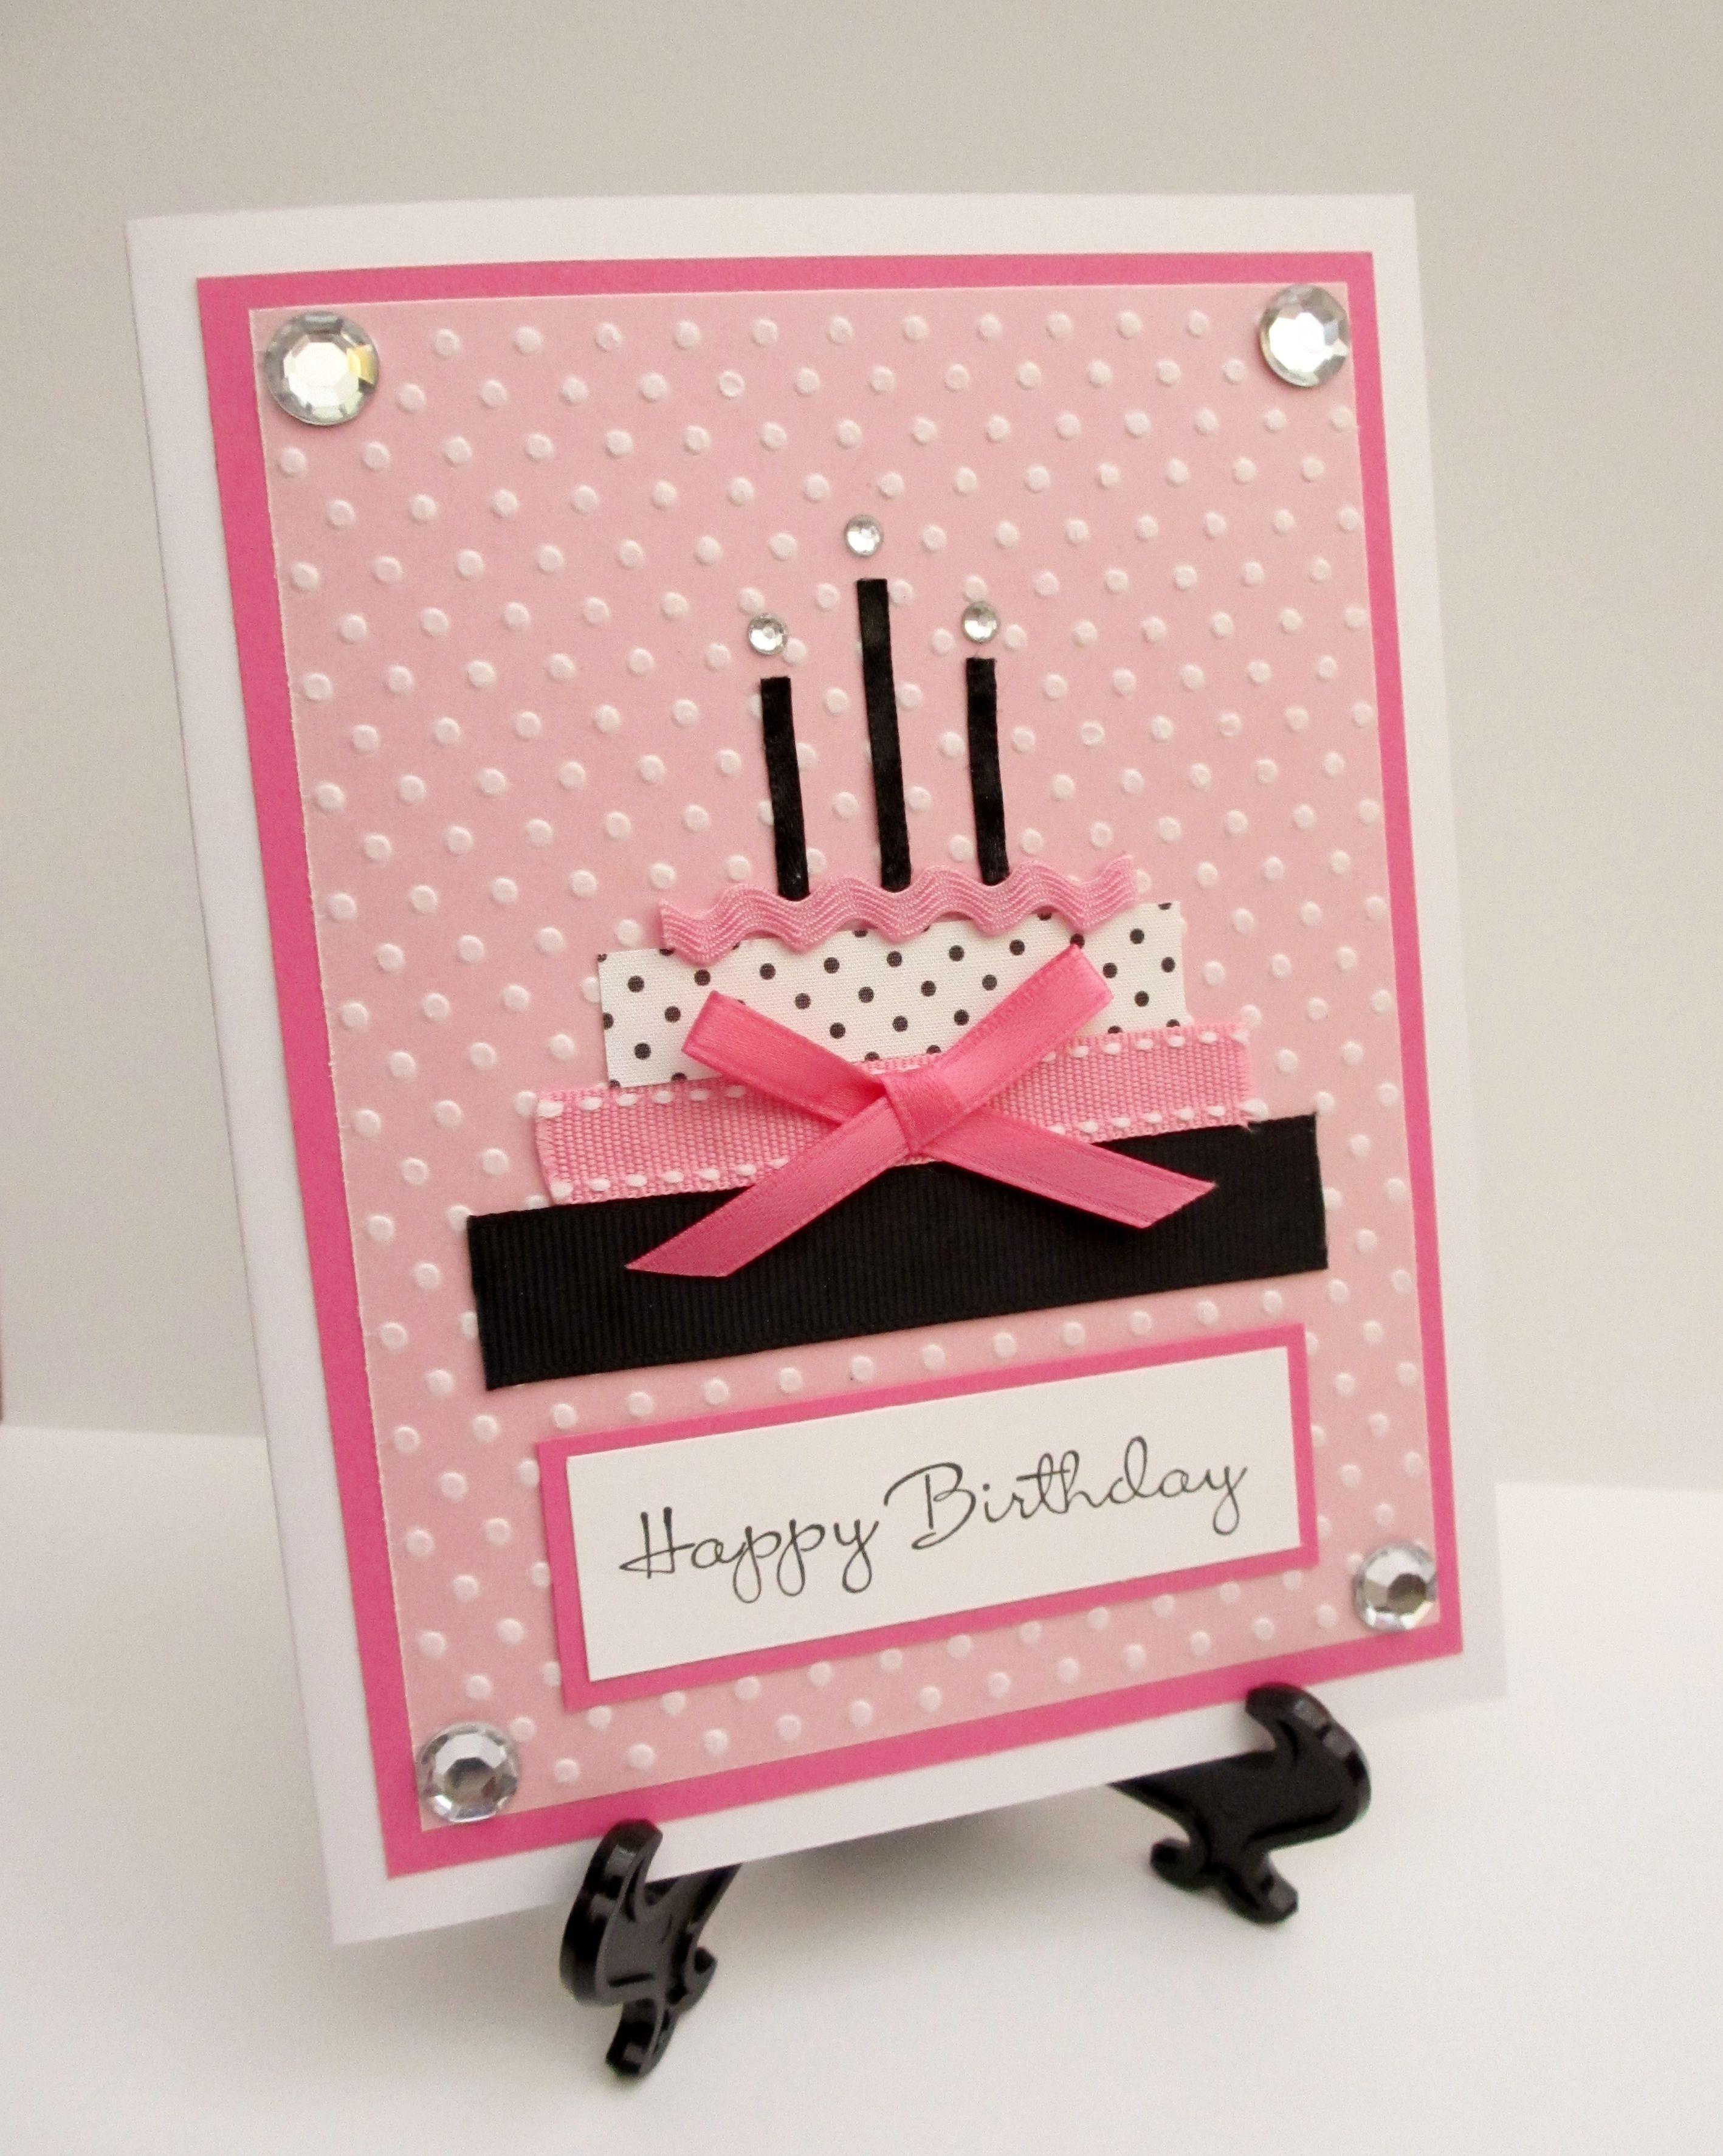 Handmade sophisticated pink black birthday cake card by anything handmade sophisticated pink black birthday cake card by anything scrappy anythingscrappy kristyandbryce Images